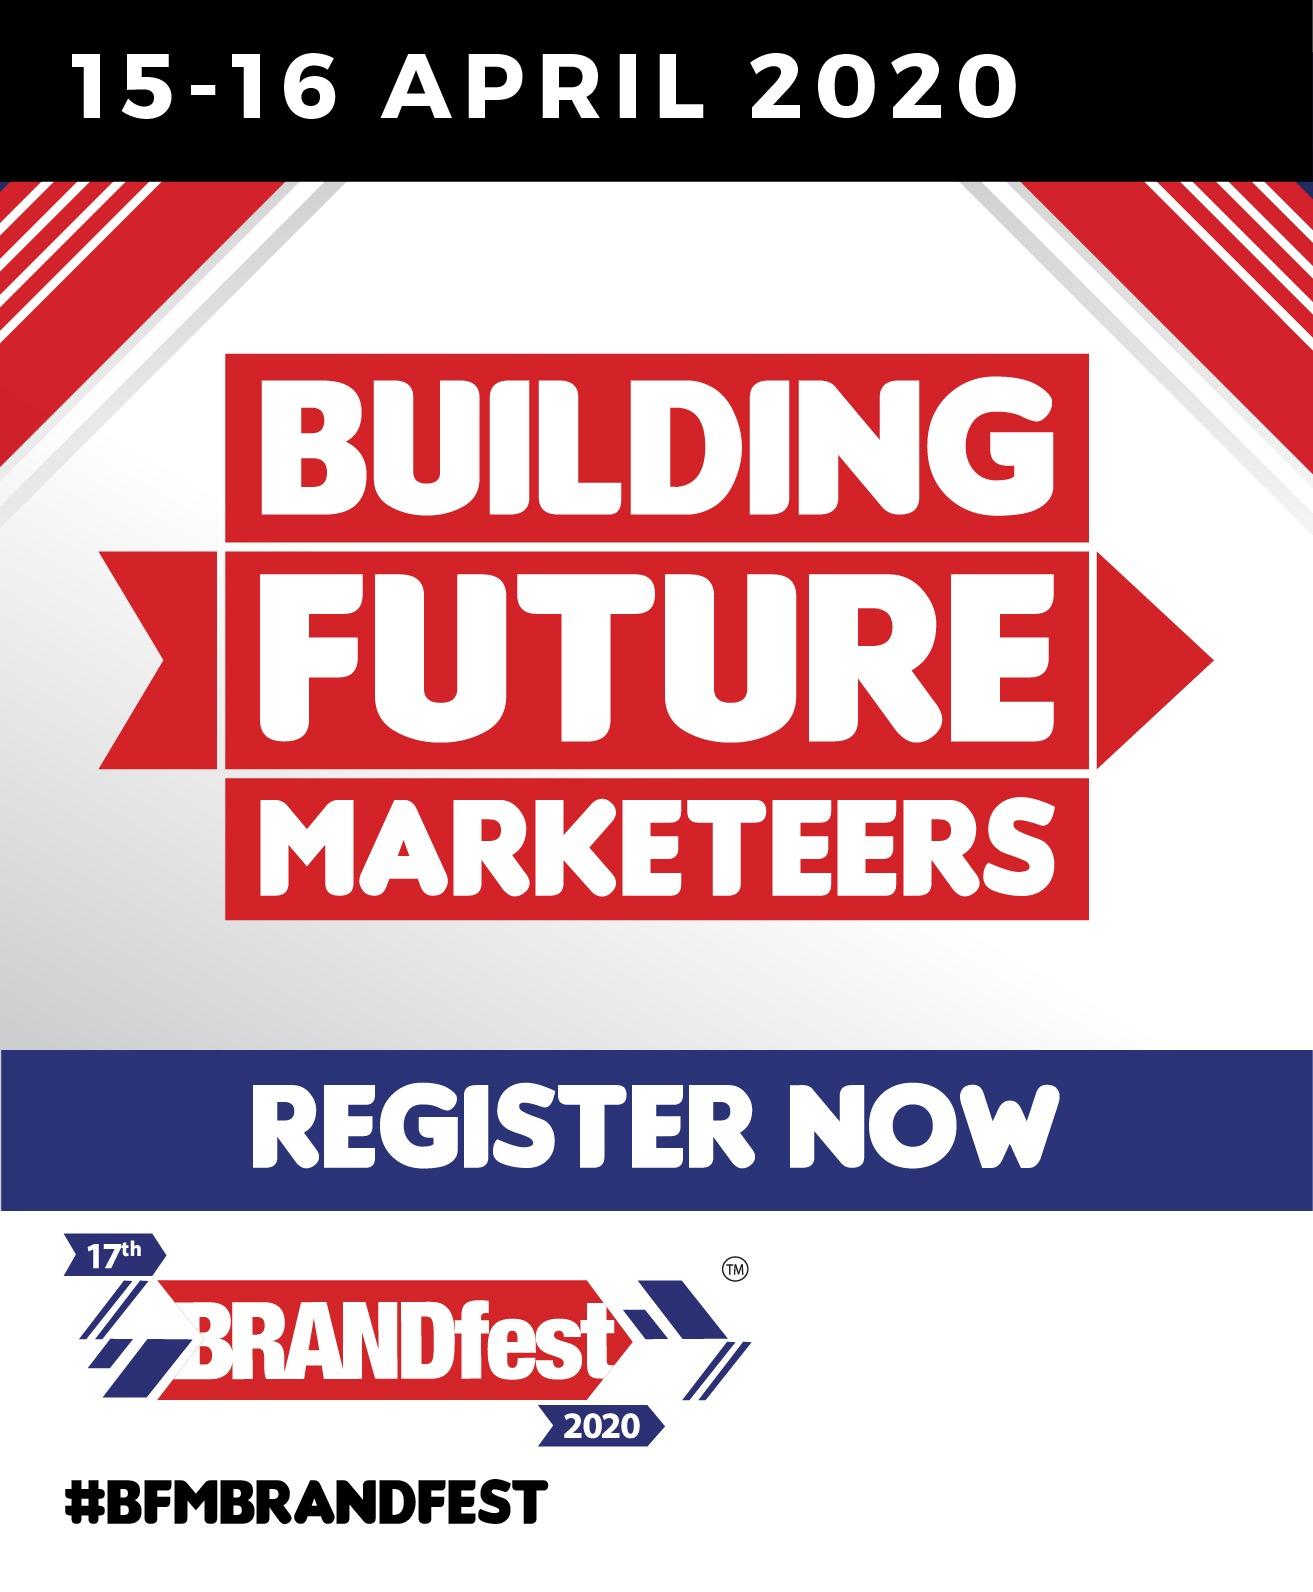 BFM Brandfest 2020